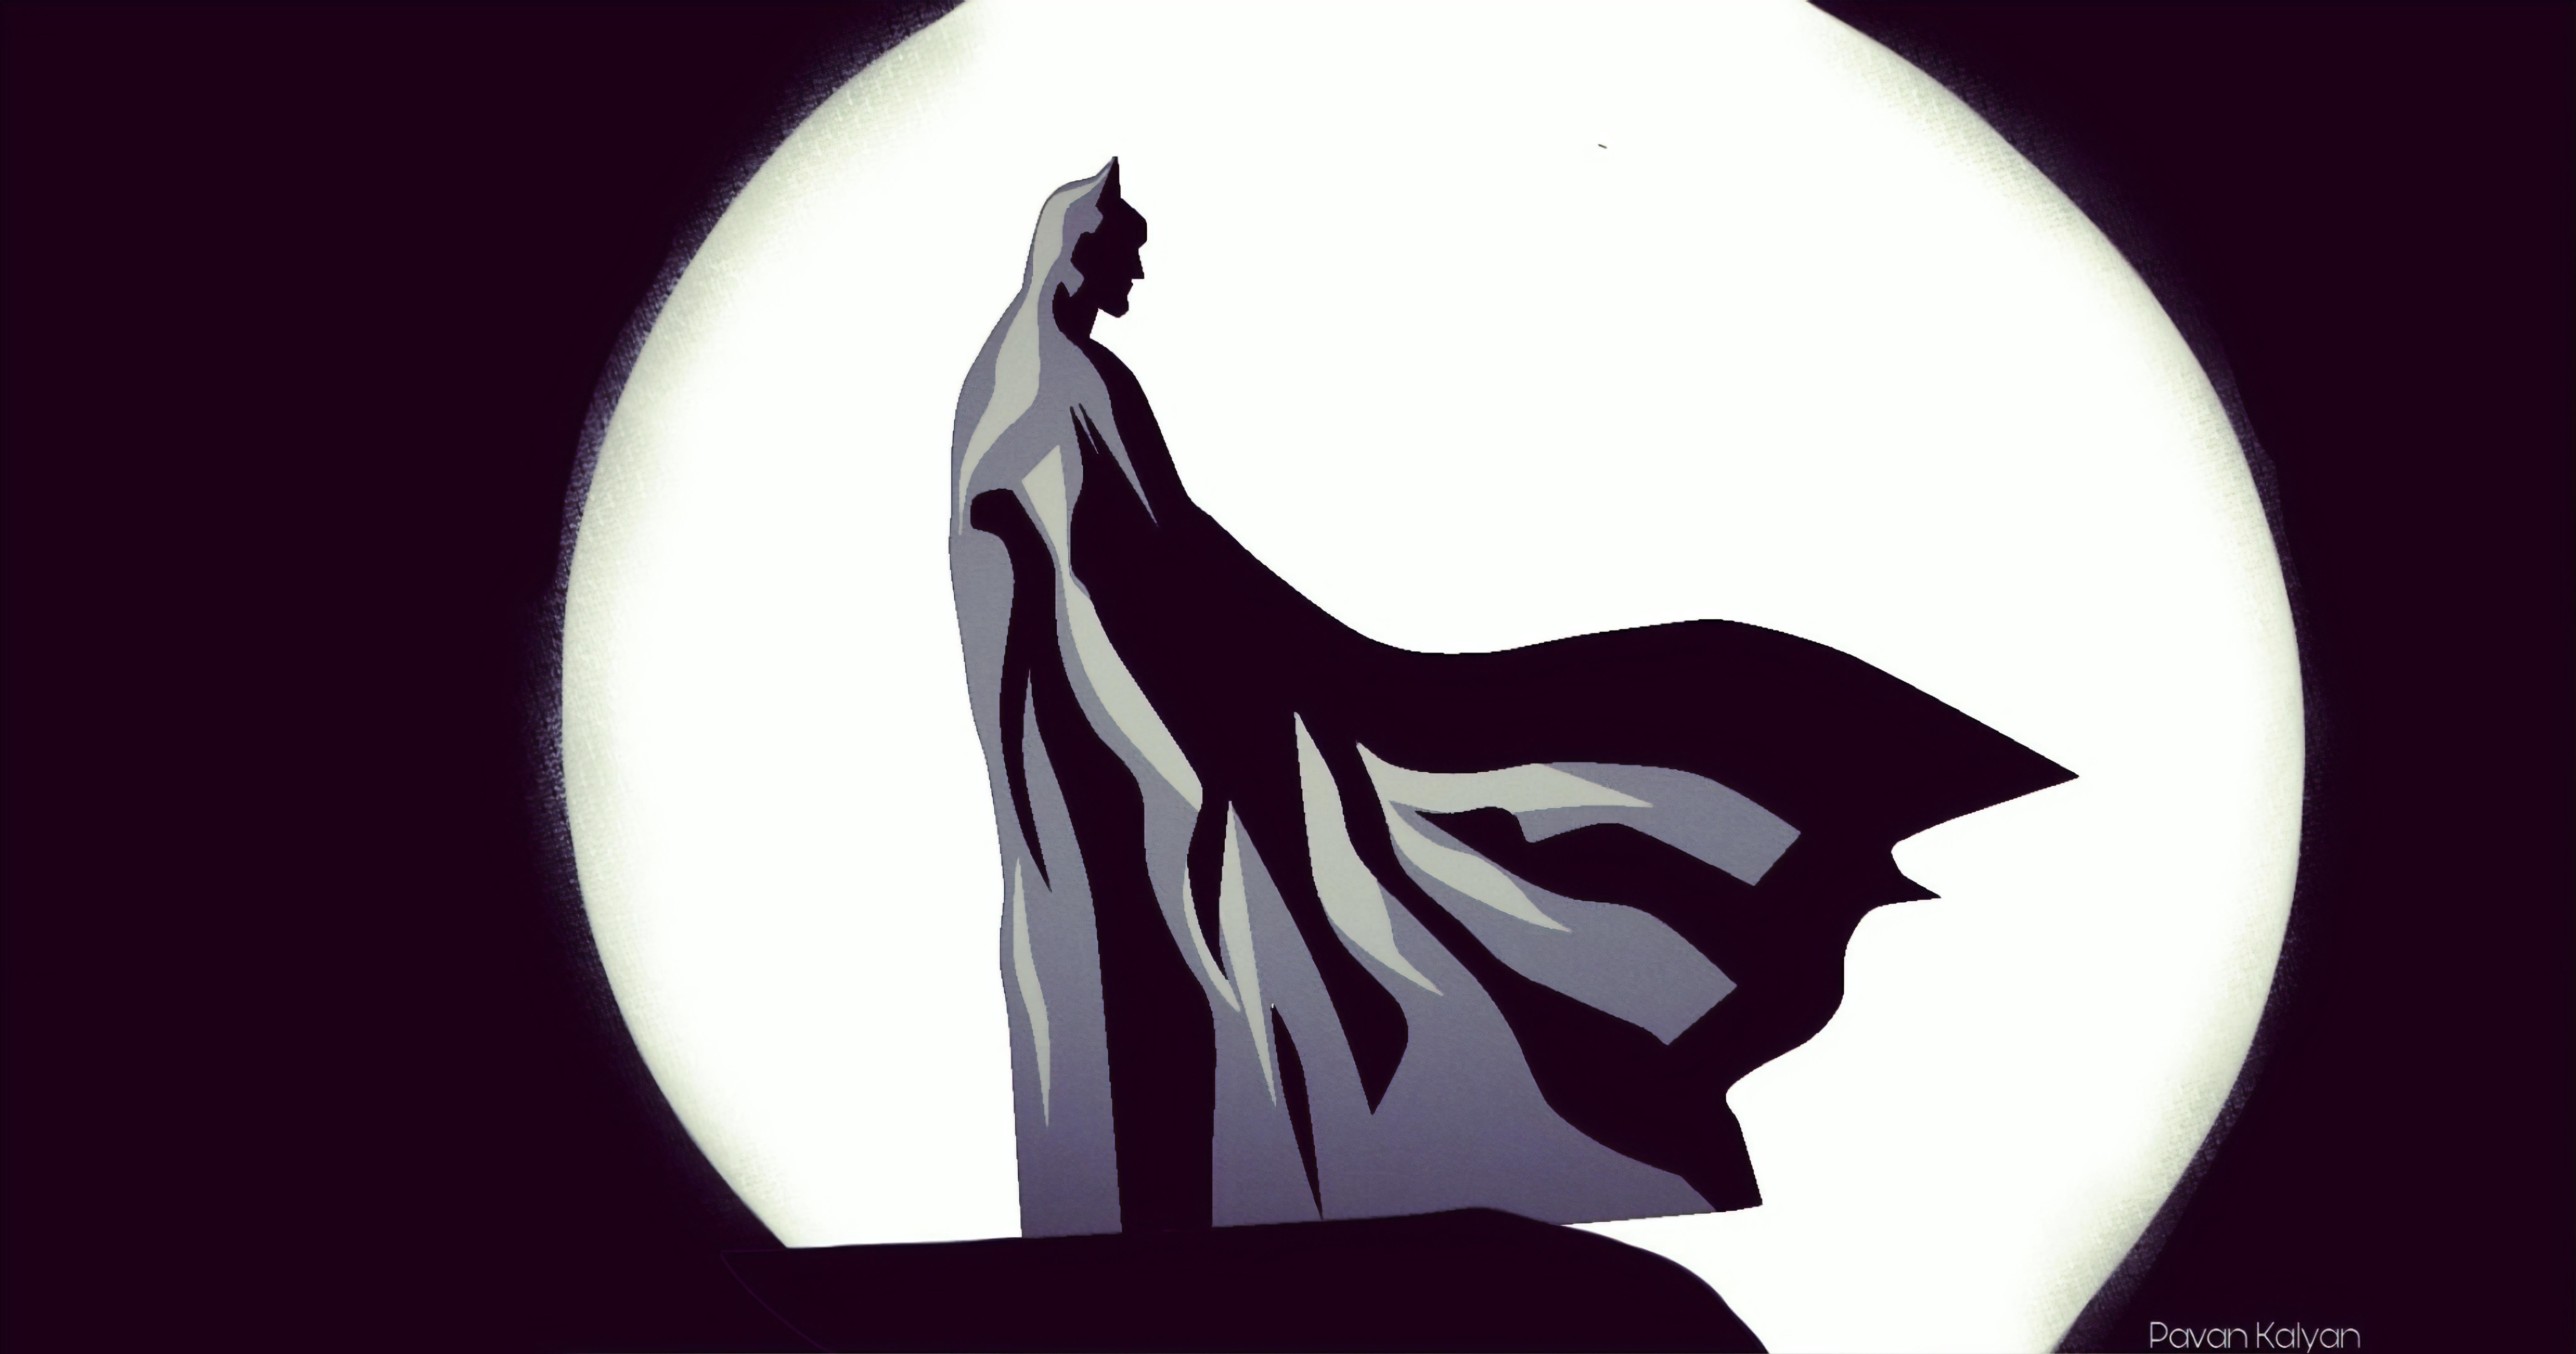 batman shadow 1581355452 - Batman Shadow - batman wallpapers, batman wallpaper phone 4k hd, batman wallpaper 4k, batman dark knight wallpaper 4k, batman art wallpaper 4k, Batman 4k wallpapers